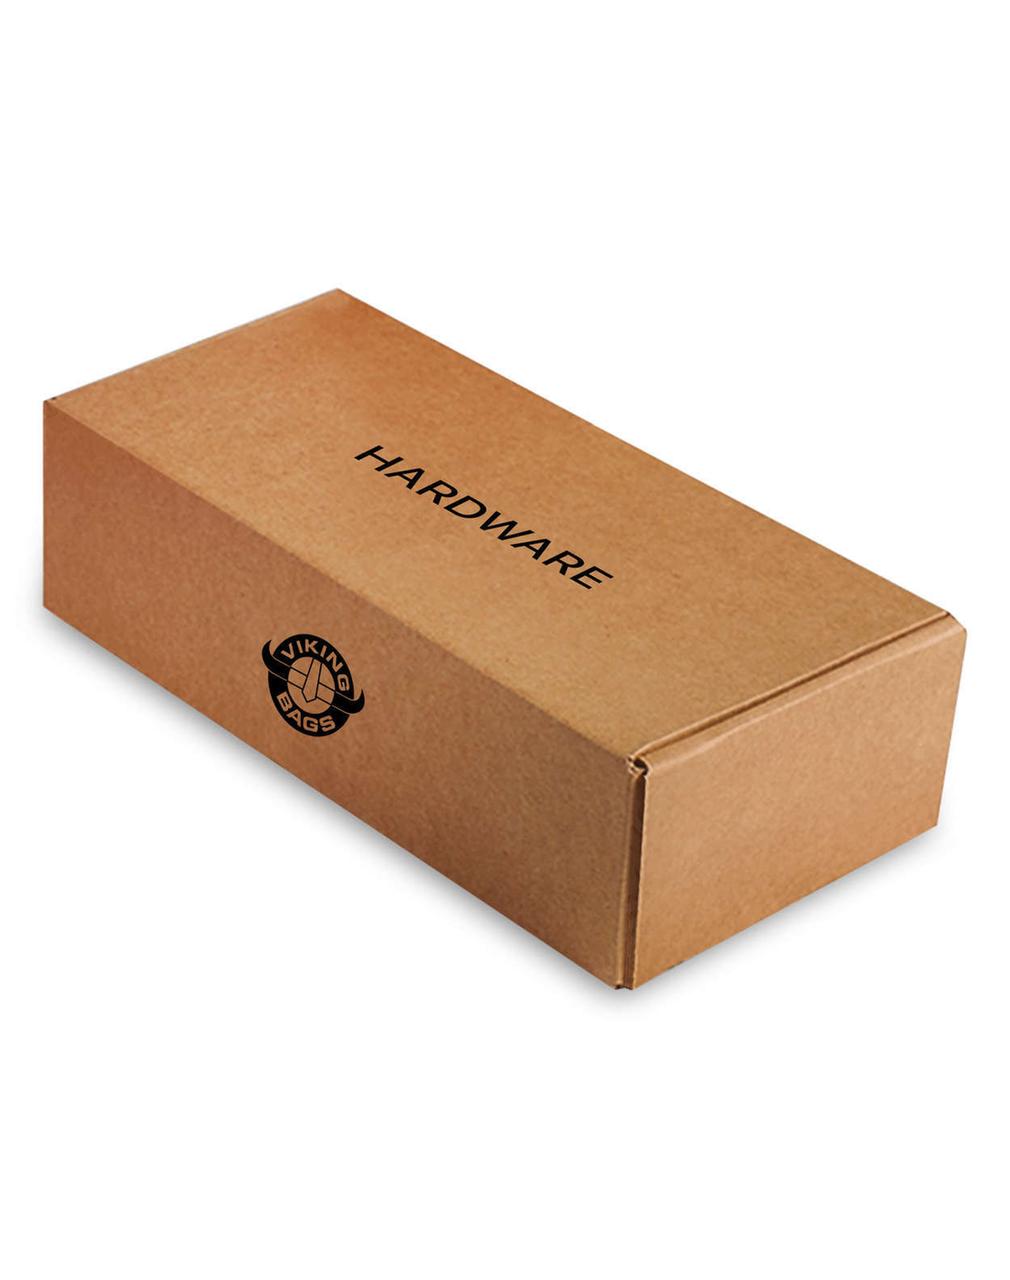 Triumph Thunderbird Viking Lamellar Large Leather Covered Hard Saddlebags Box